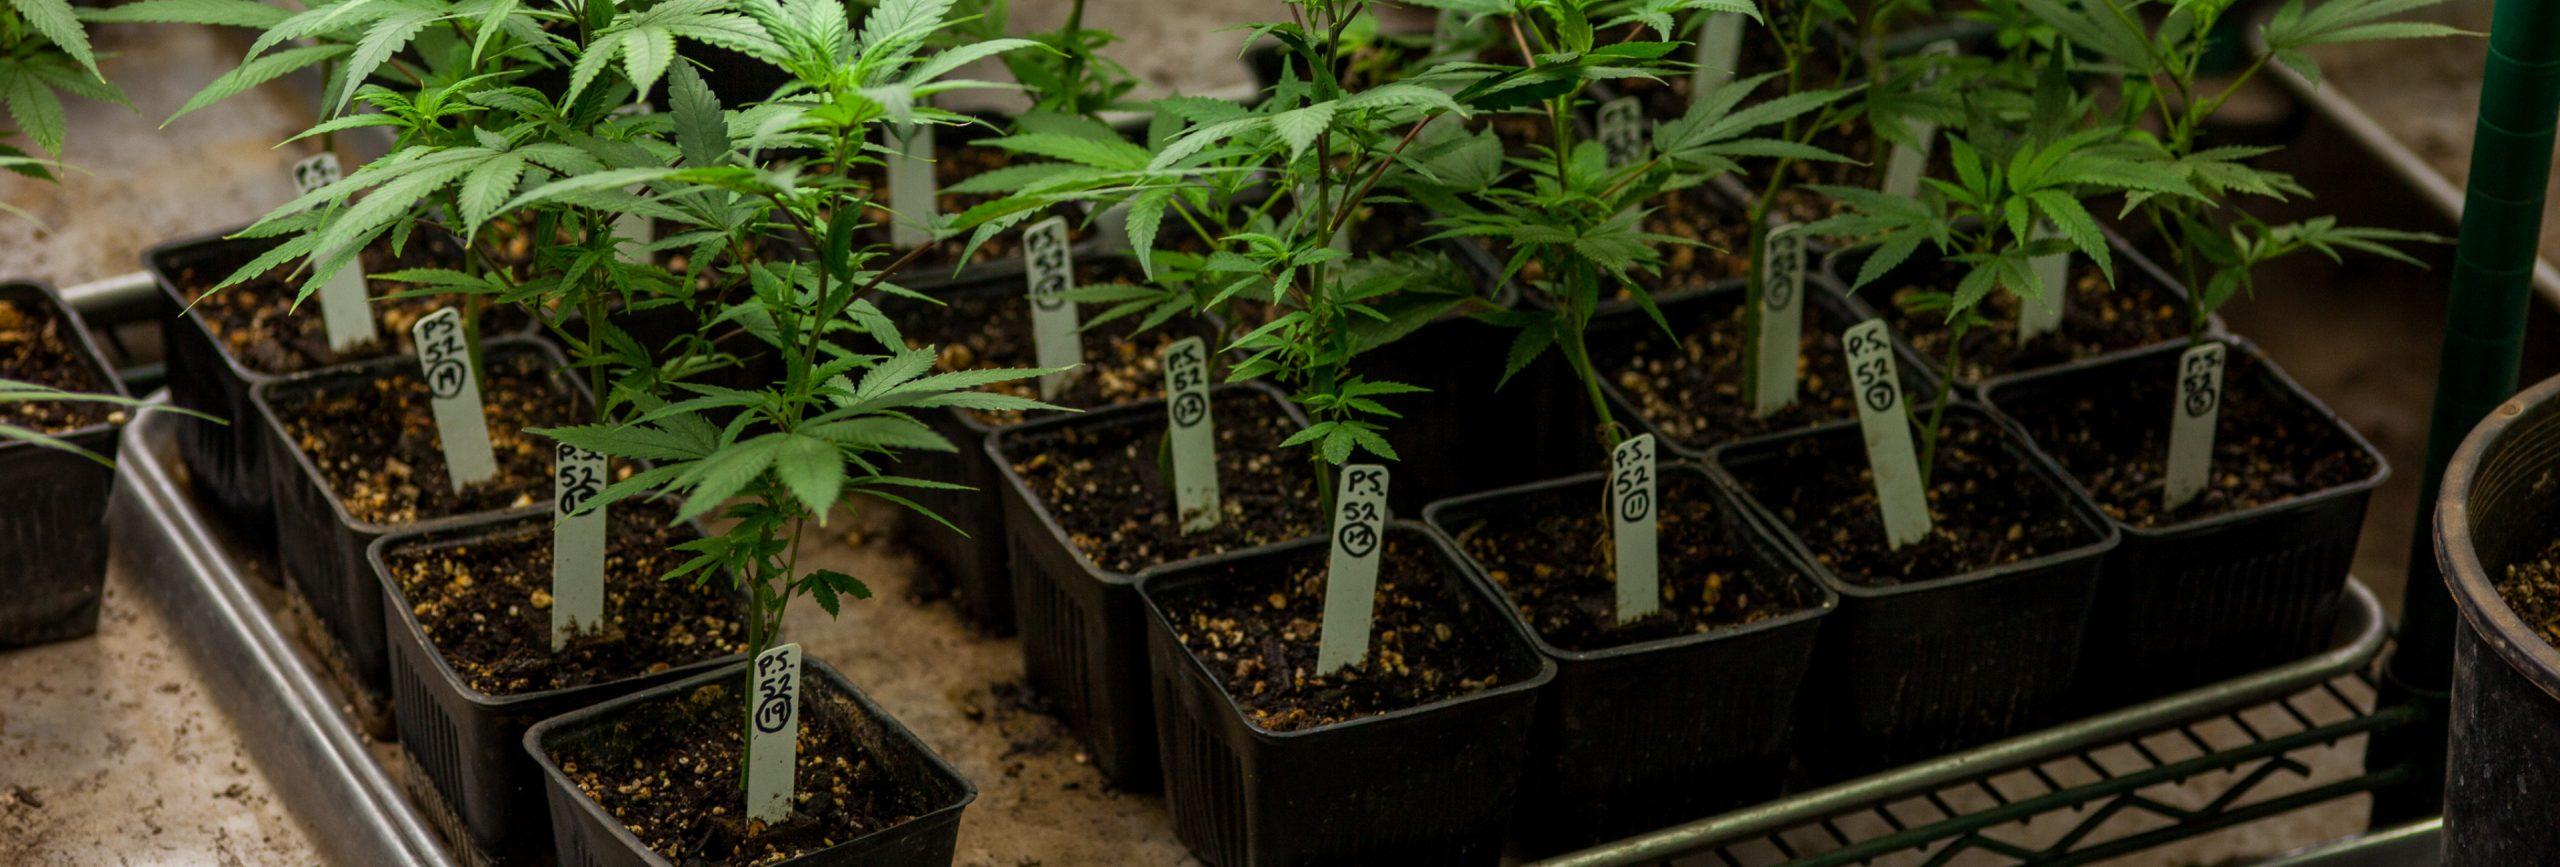 Medicinal crops